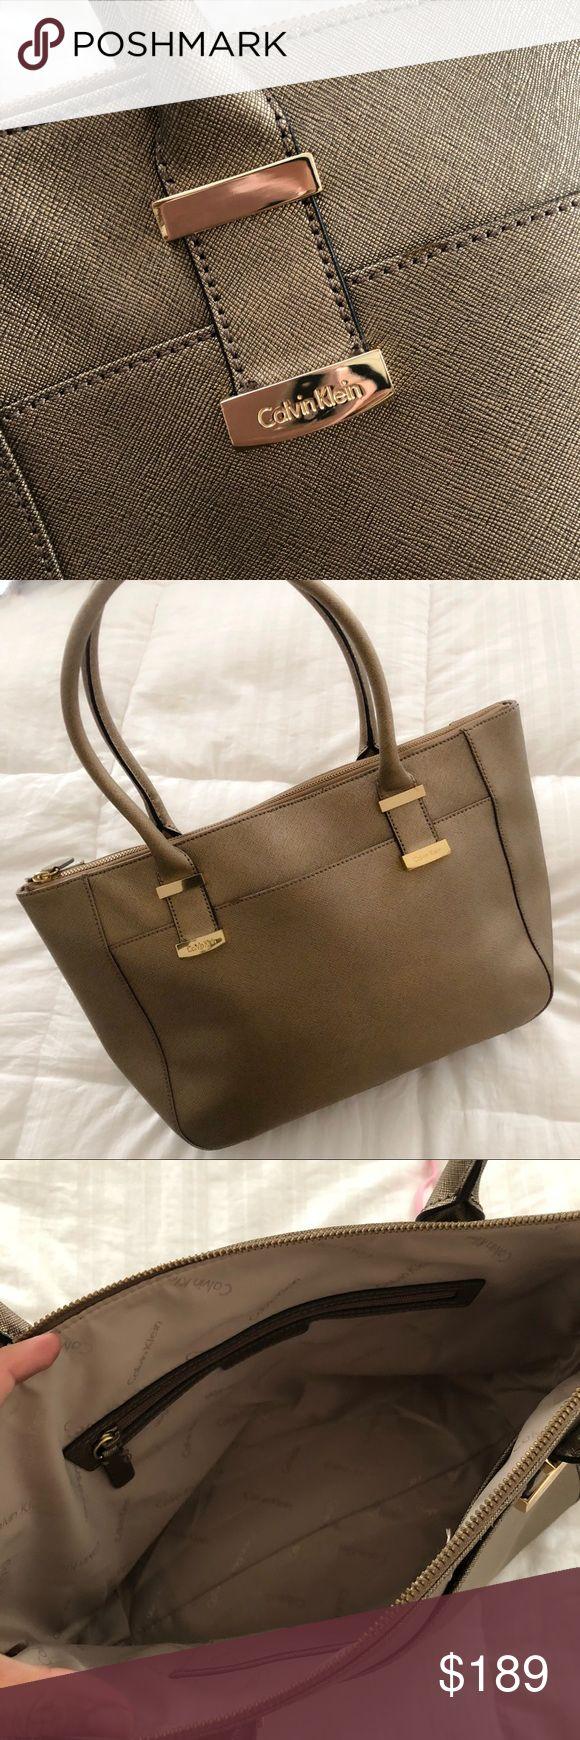 "NWOT- Calvin Klein Metallic Gold Shoulder Bag NEW NEW NEW - No tag but never worn. 17""x10.5""x6"" Calvin Klein Bags Shoulder Bags"